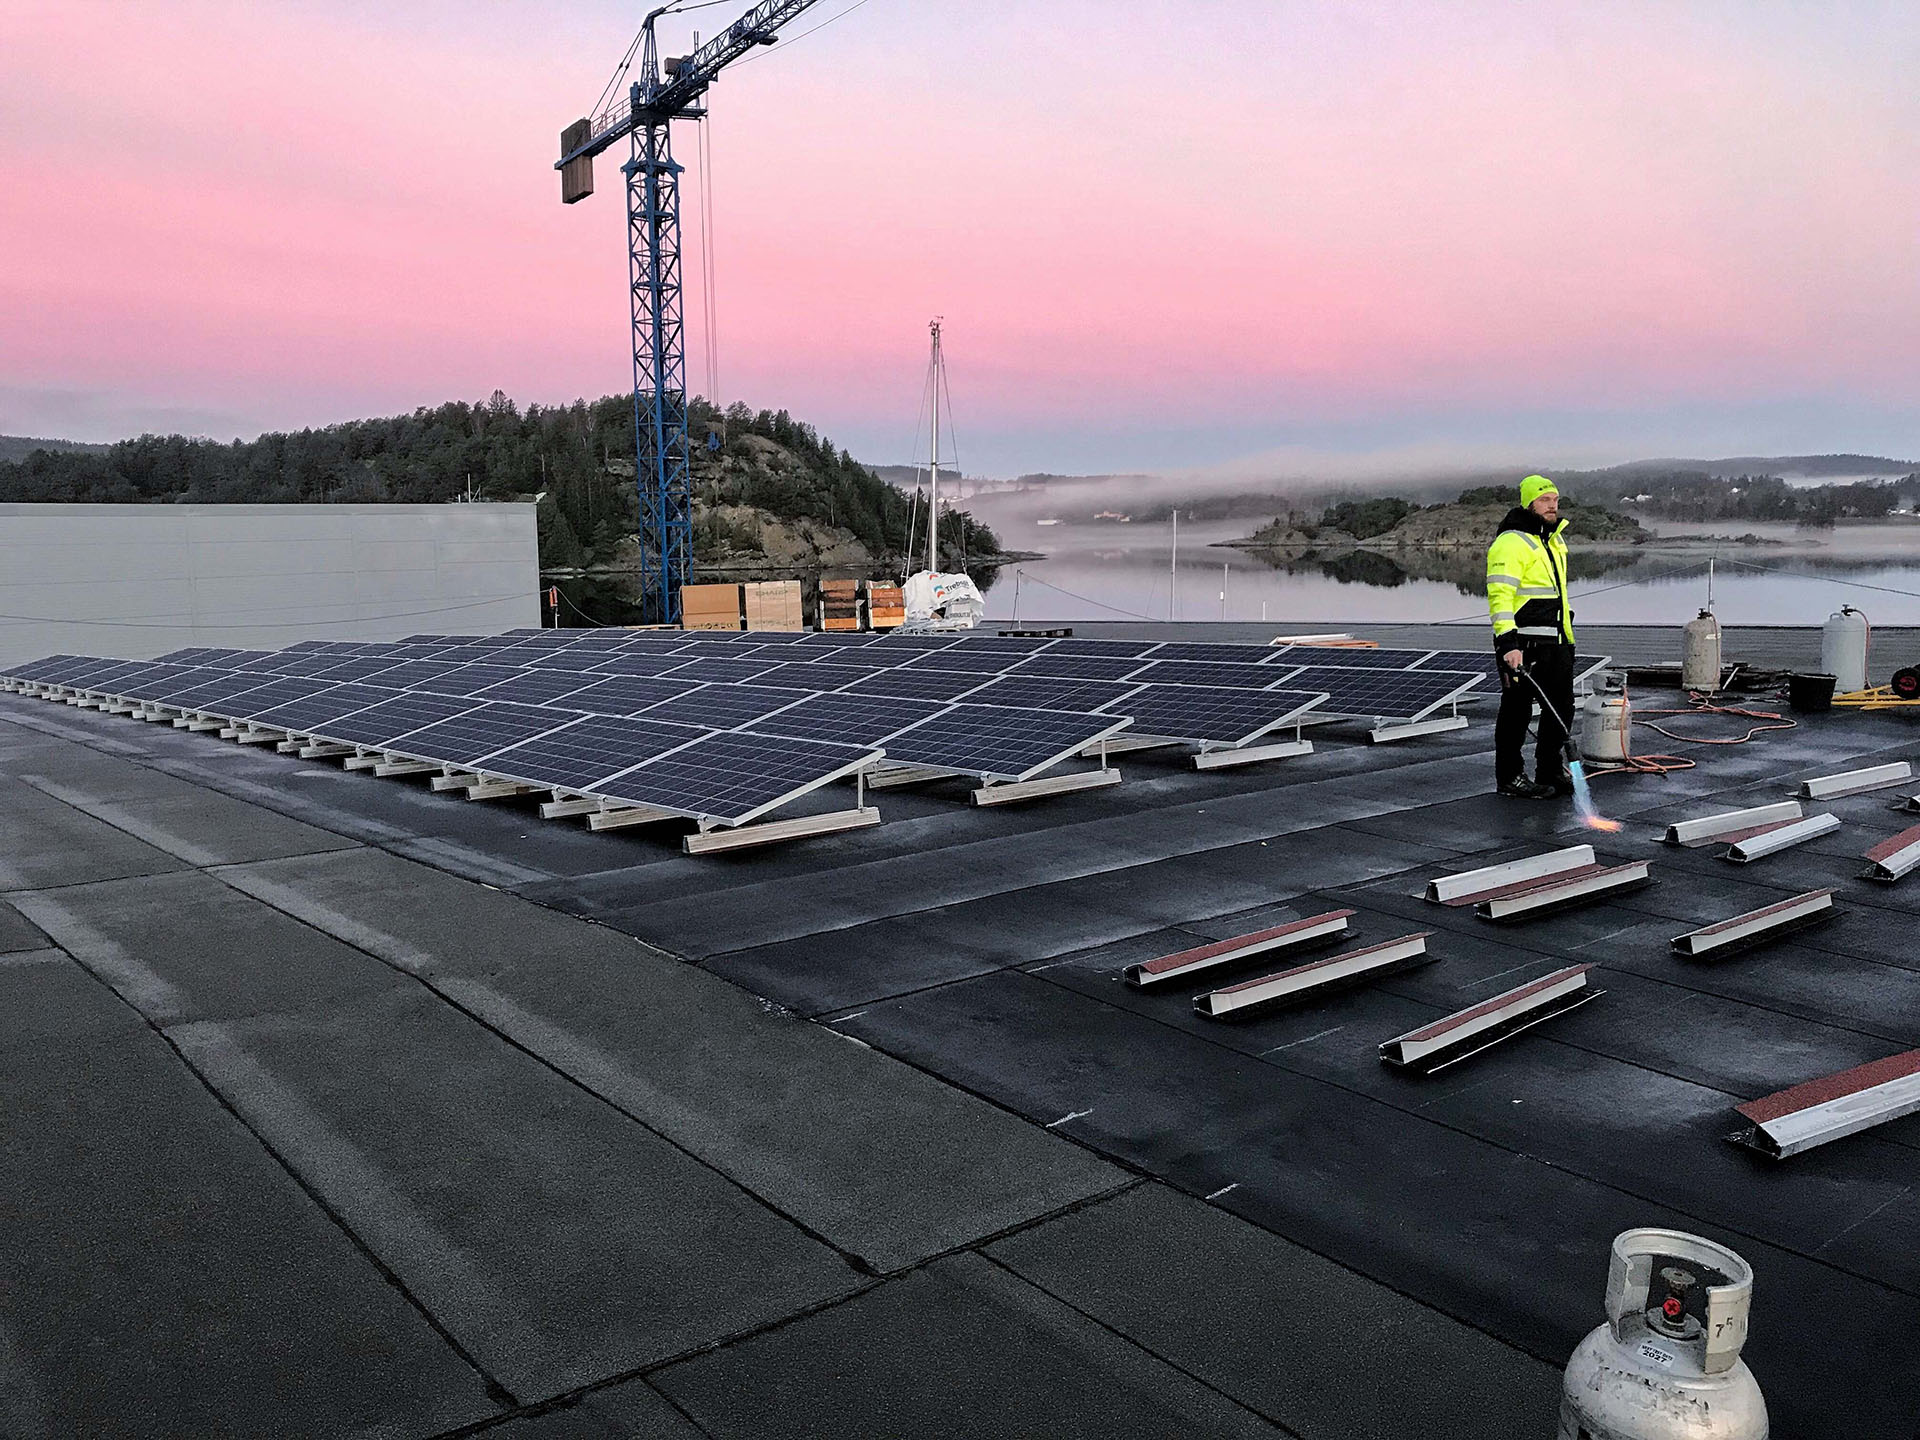 Photovoltaic-solar-panels-shipyard-Sweden-bitumen-flat-roof-no-ballast